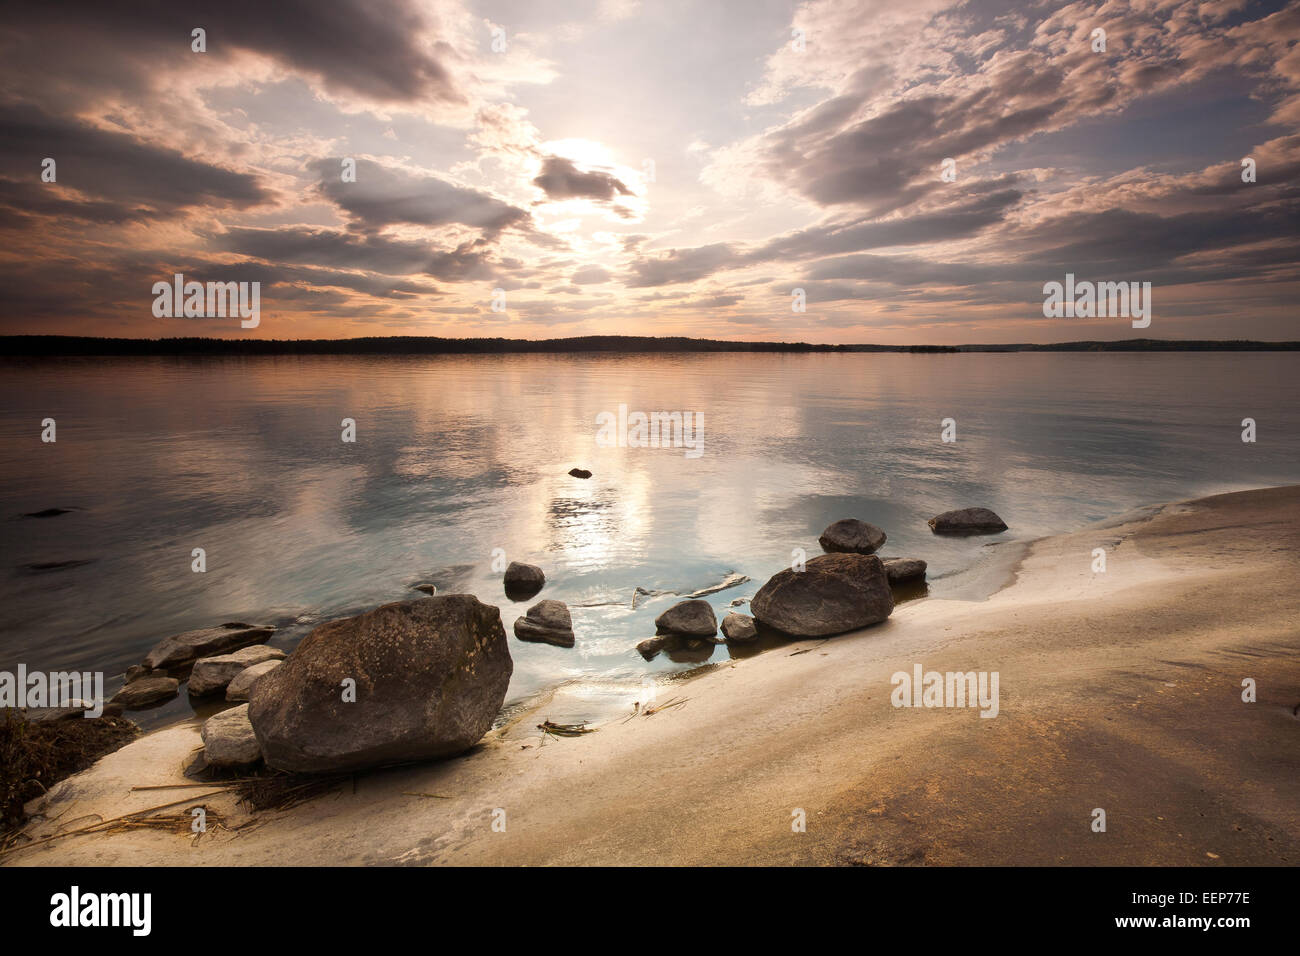 Sonnenuntergang auf der Insel Brattholmen in den See Vansjø, Råde Kommune, Østfold Fylke, Norwegen. Stockbild